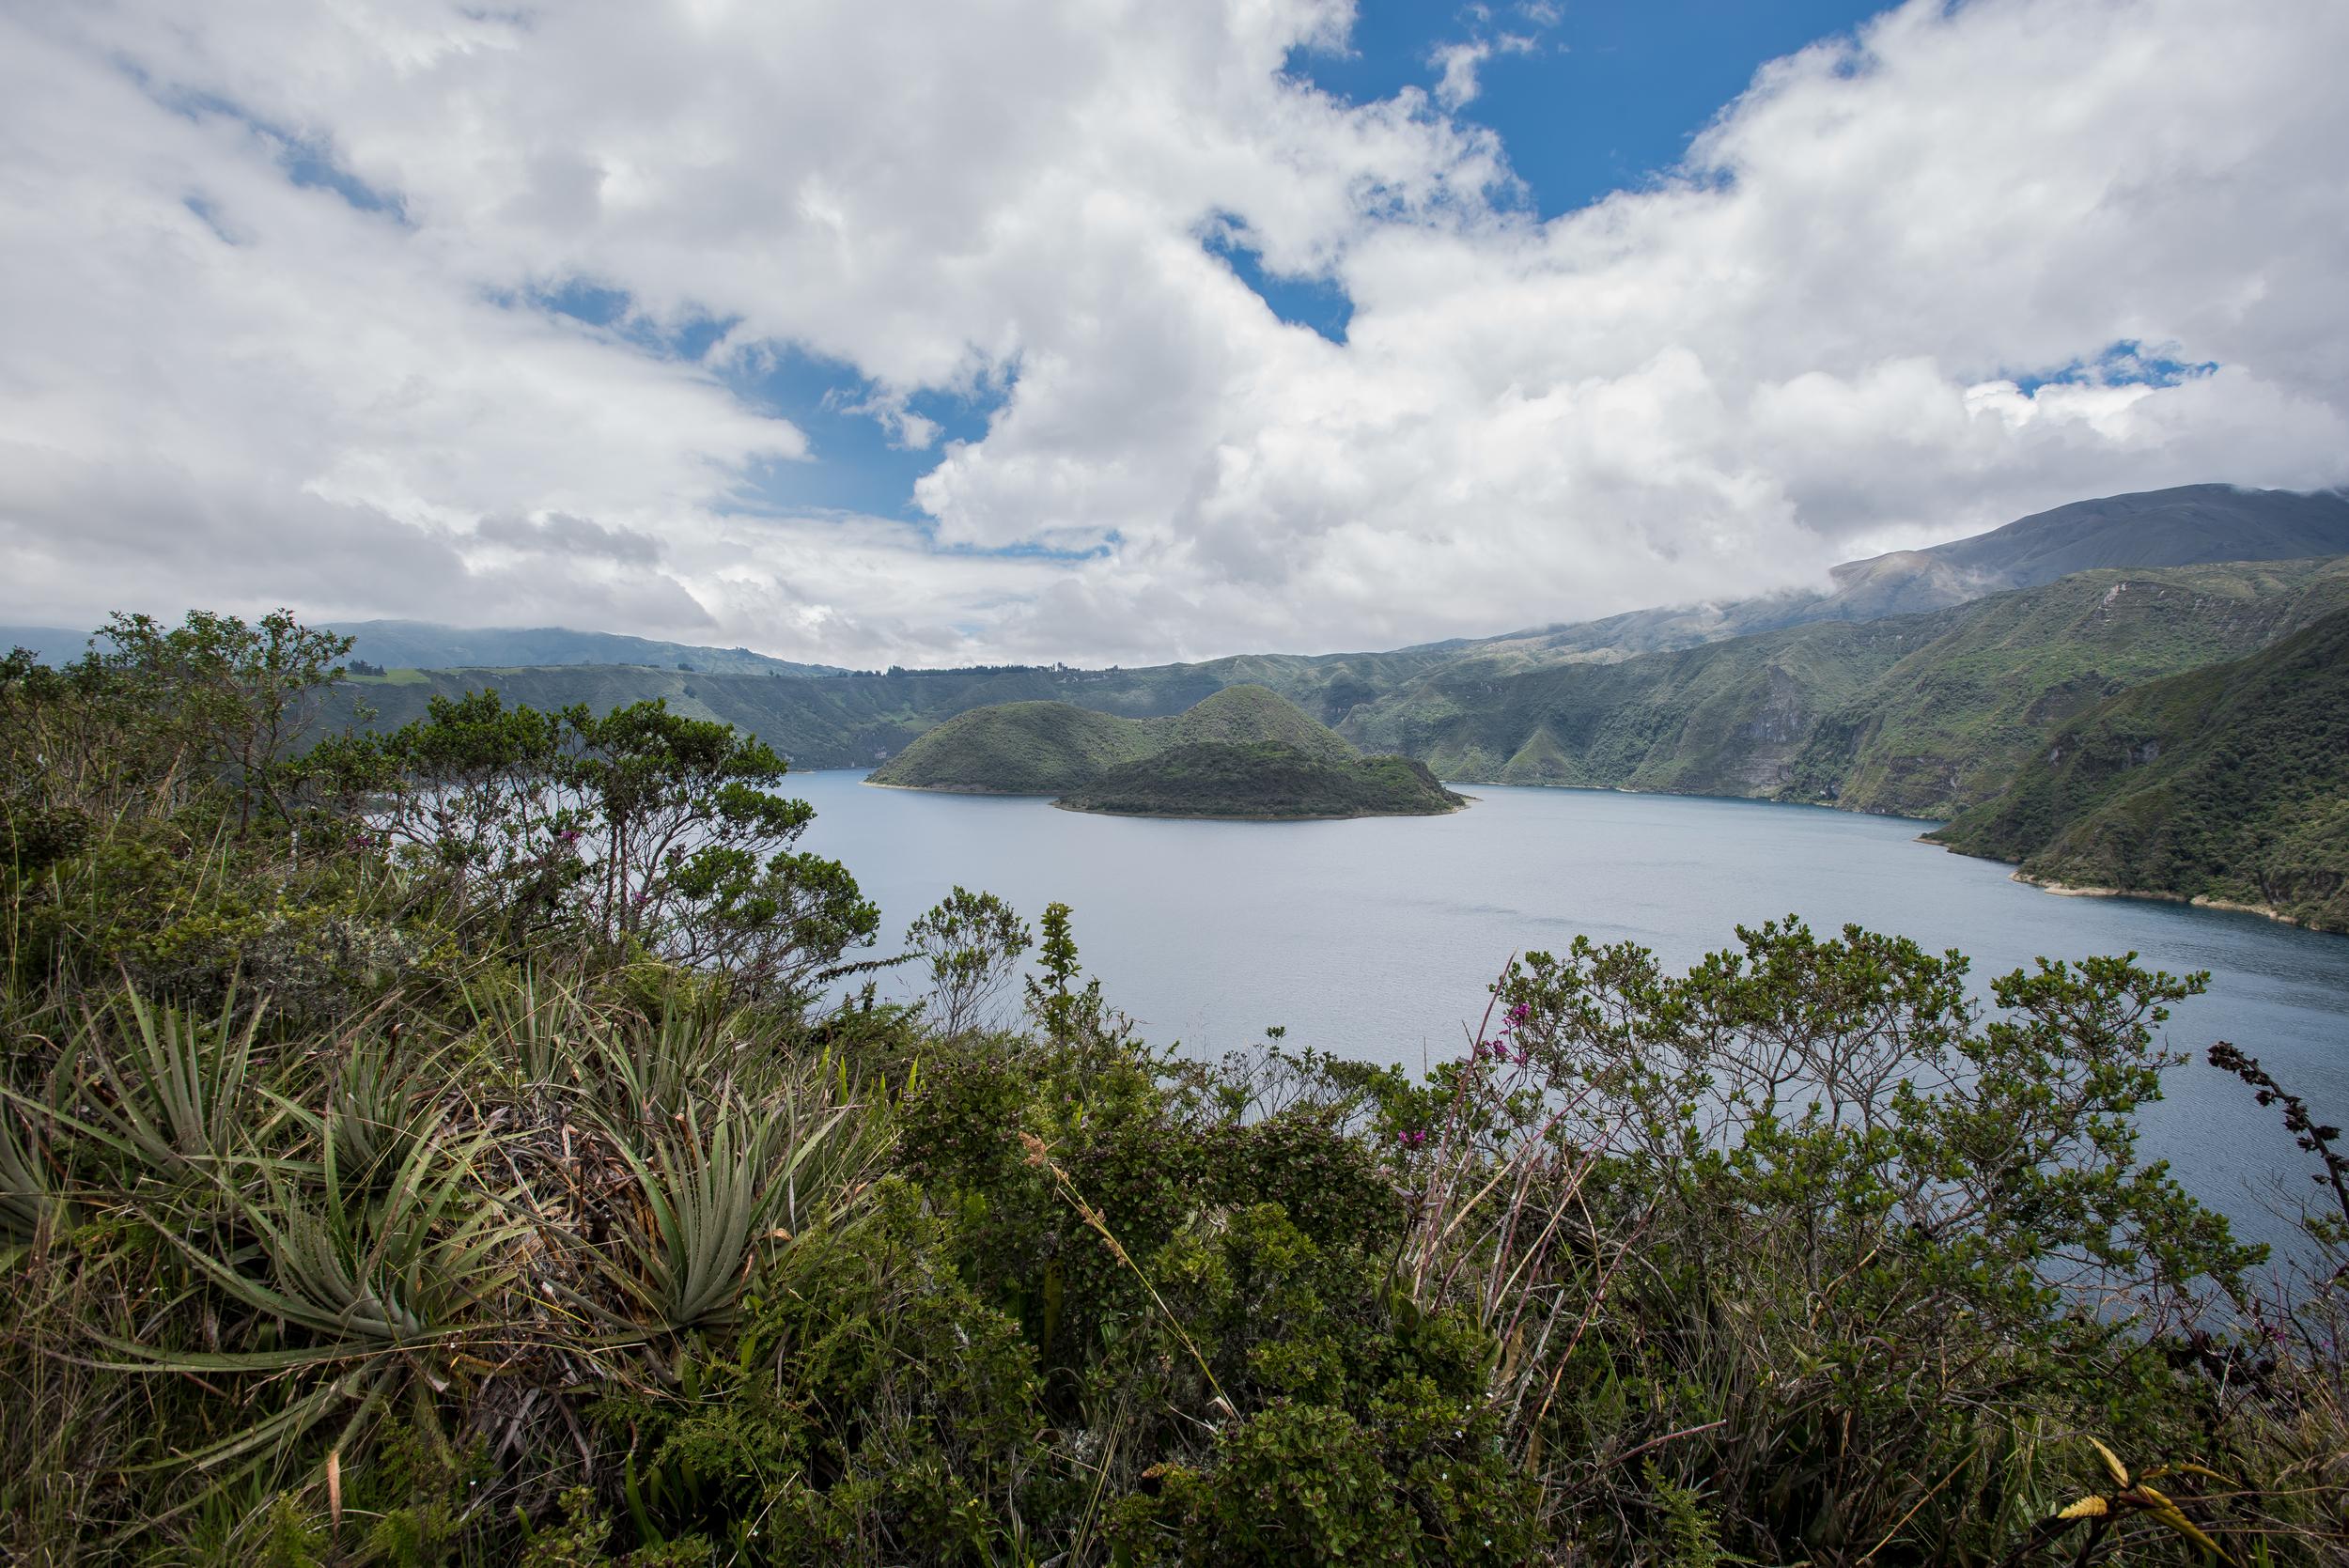 Crater Lake - Cuicocha (Otalavo, Ecuador)